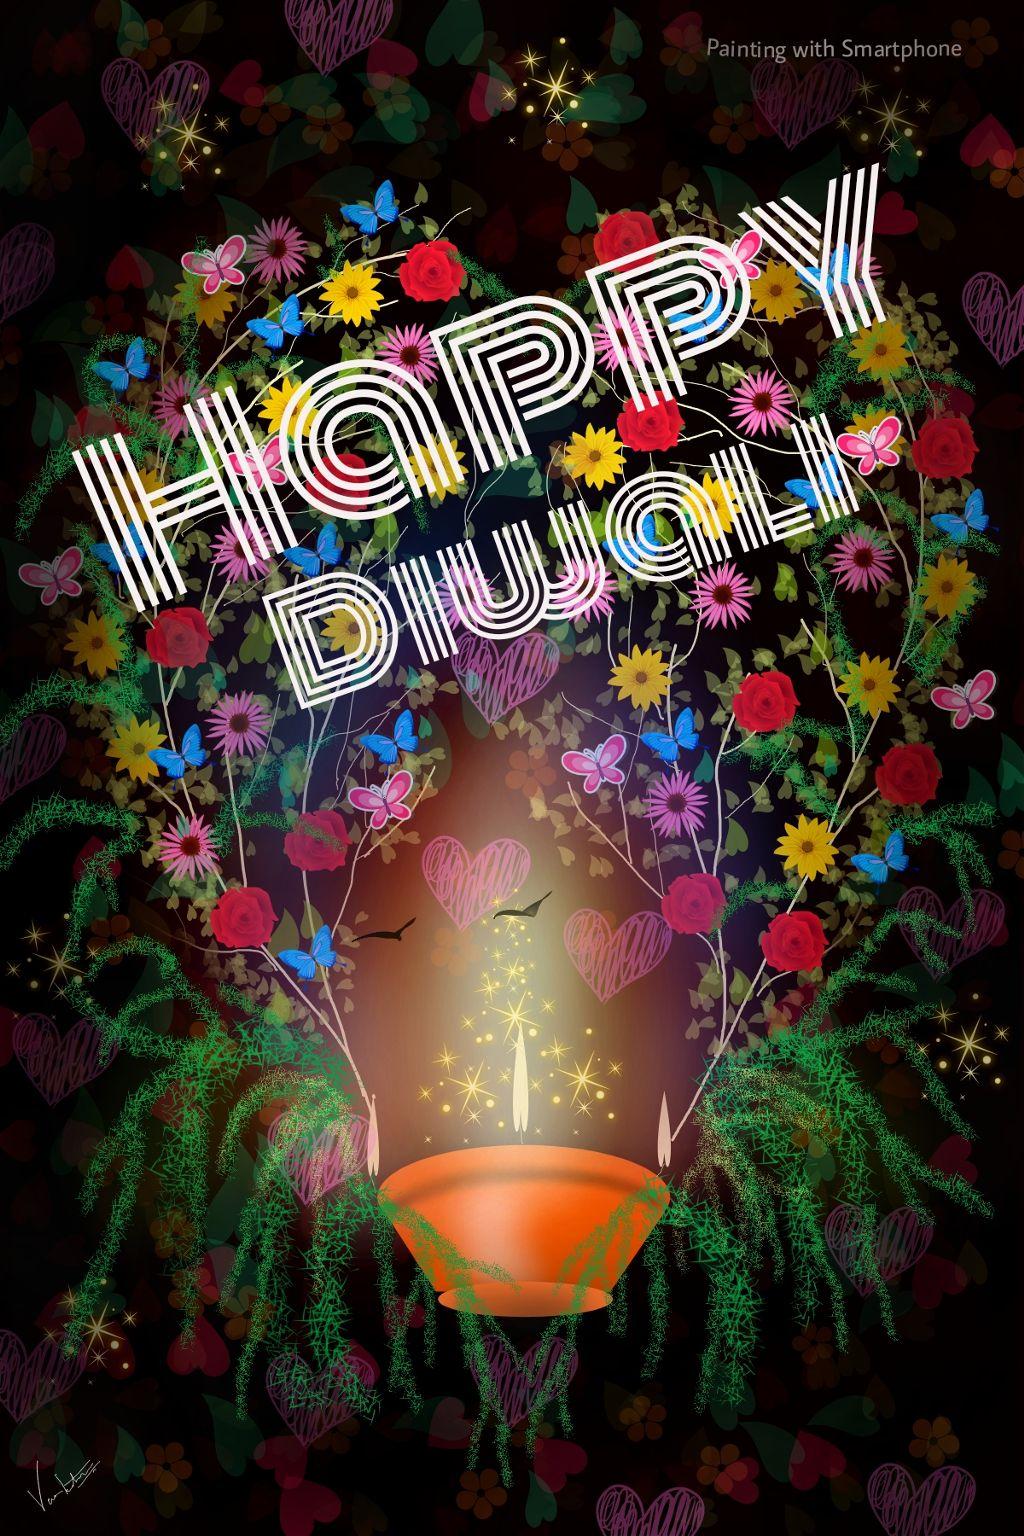 #drawing #share #Diwali2019 #enjoy #love #life